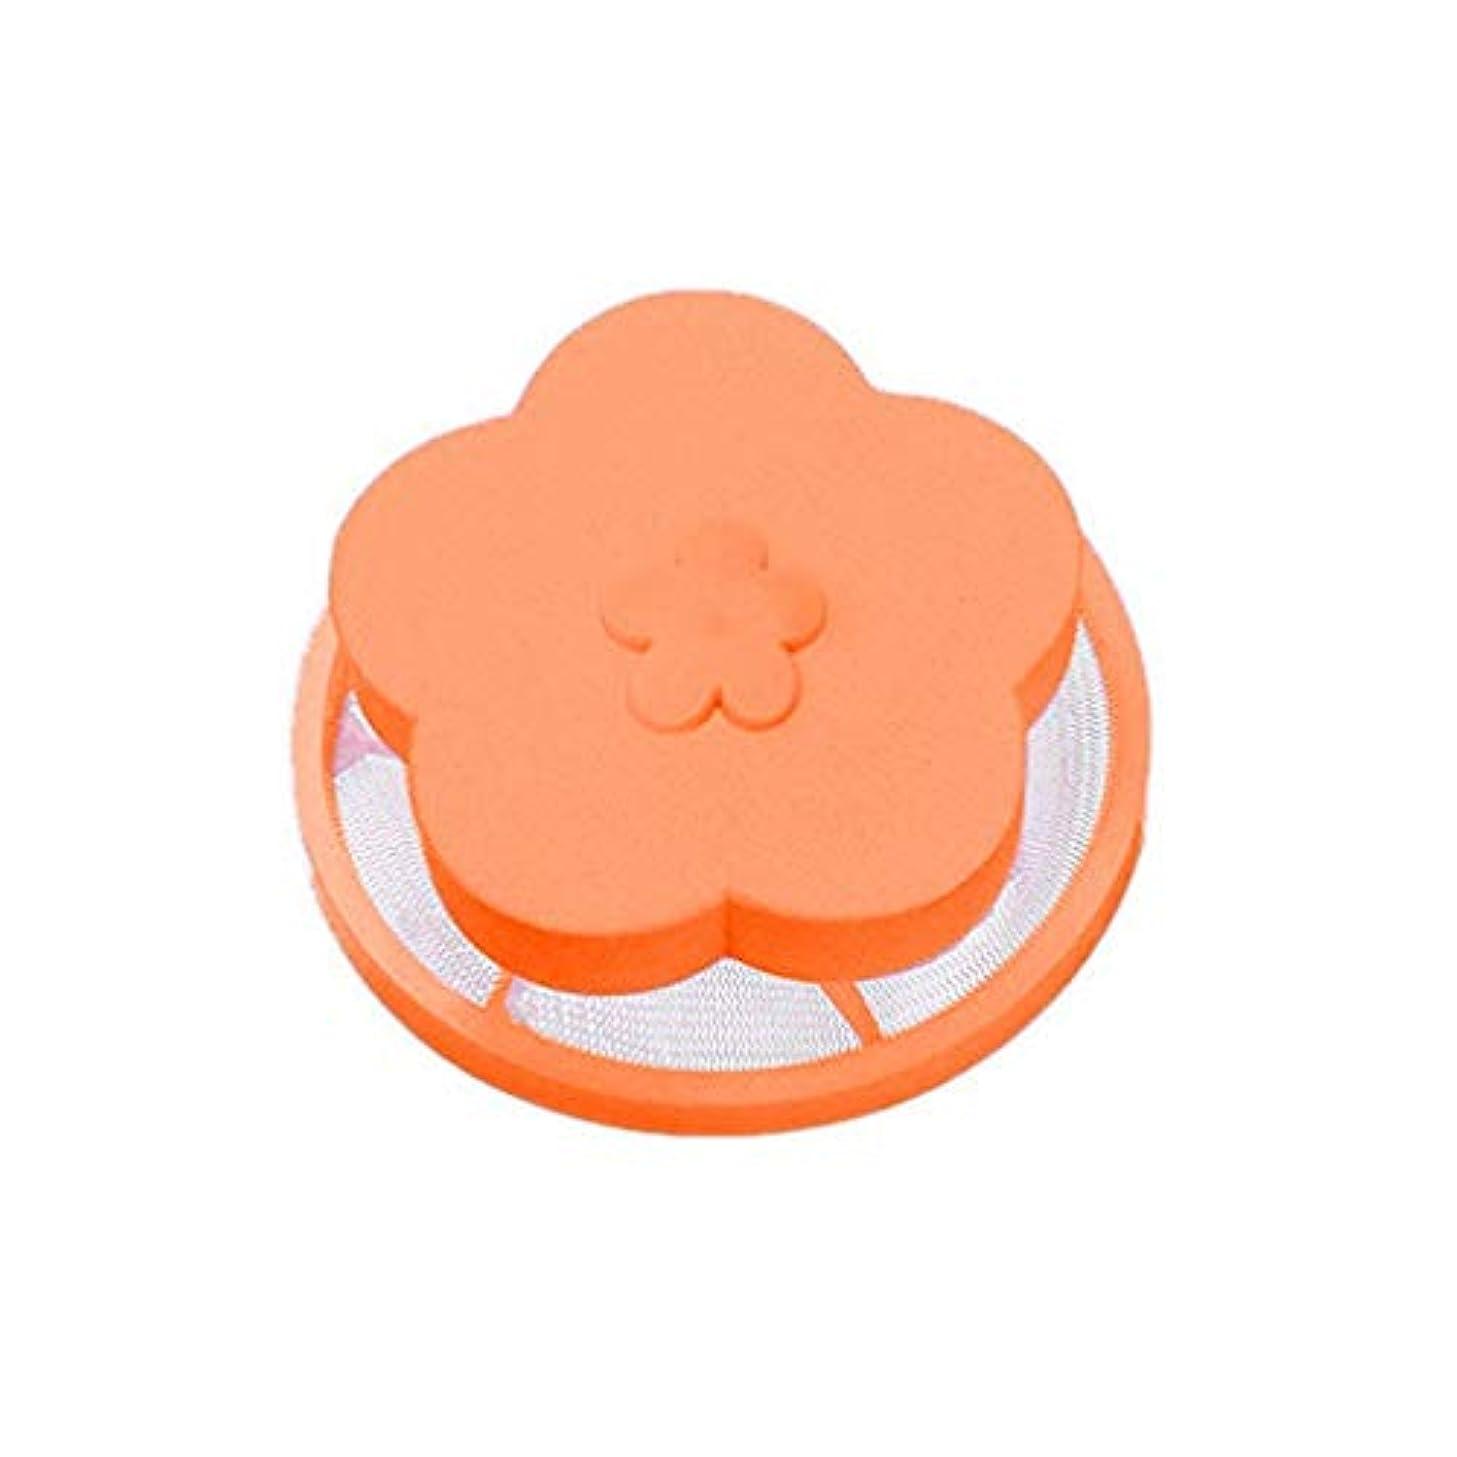 ZTY66 2Pcs Washing Machine Lint Filter Bag Laundry Mesh Hair Catcher Floating Ball Pouch